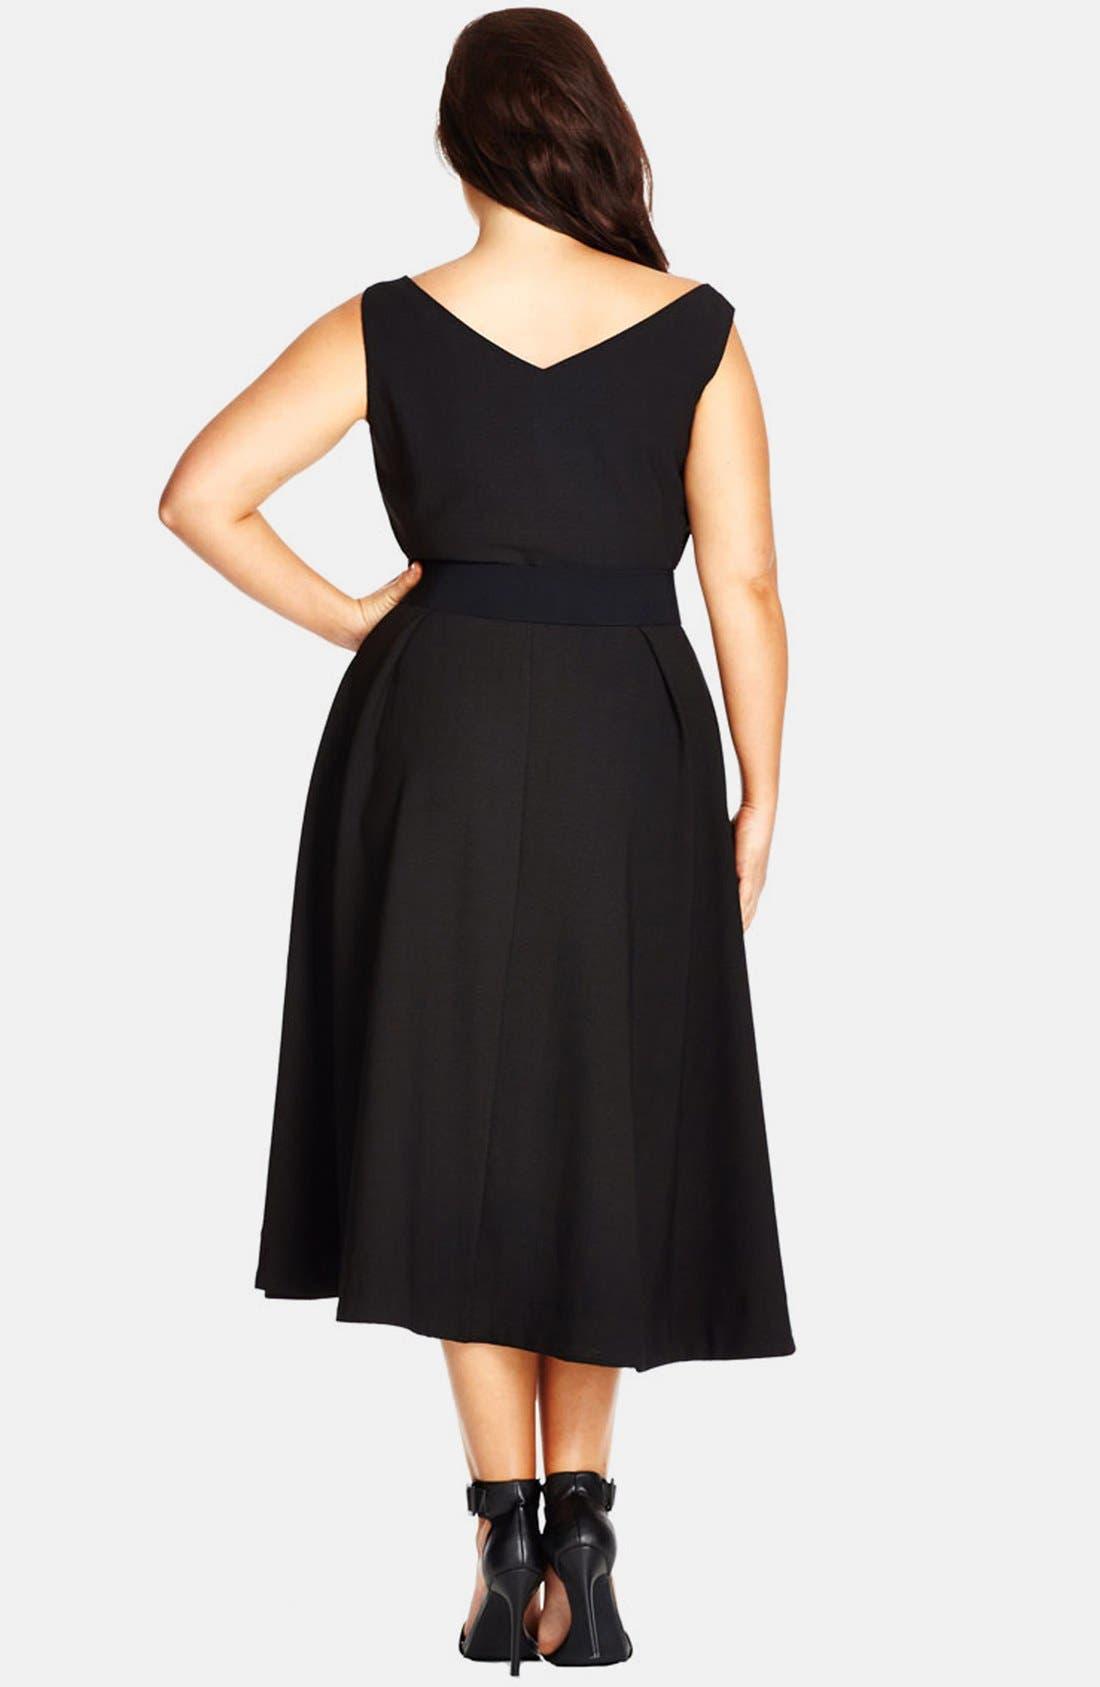 Belted Sweetheart Neck Tea Length Dress,                             Alternate thumbnail 2, color,                             Black